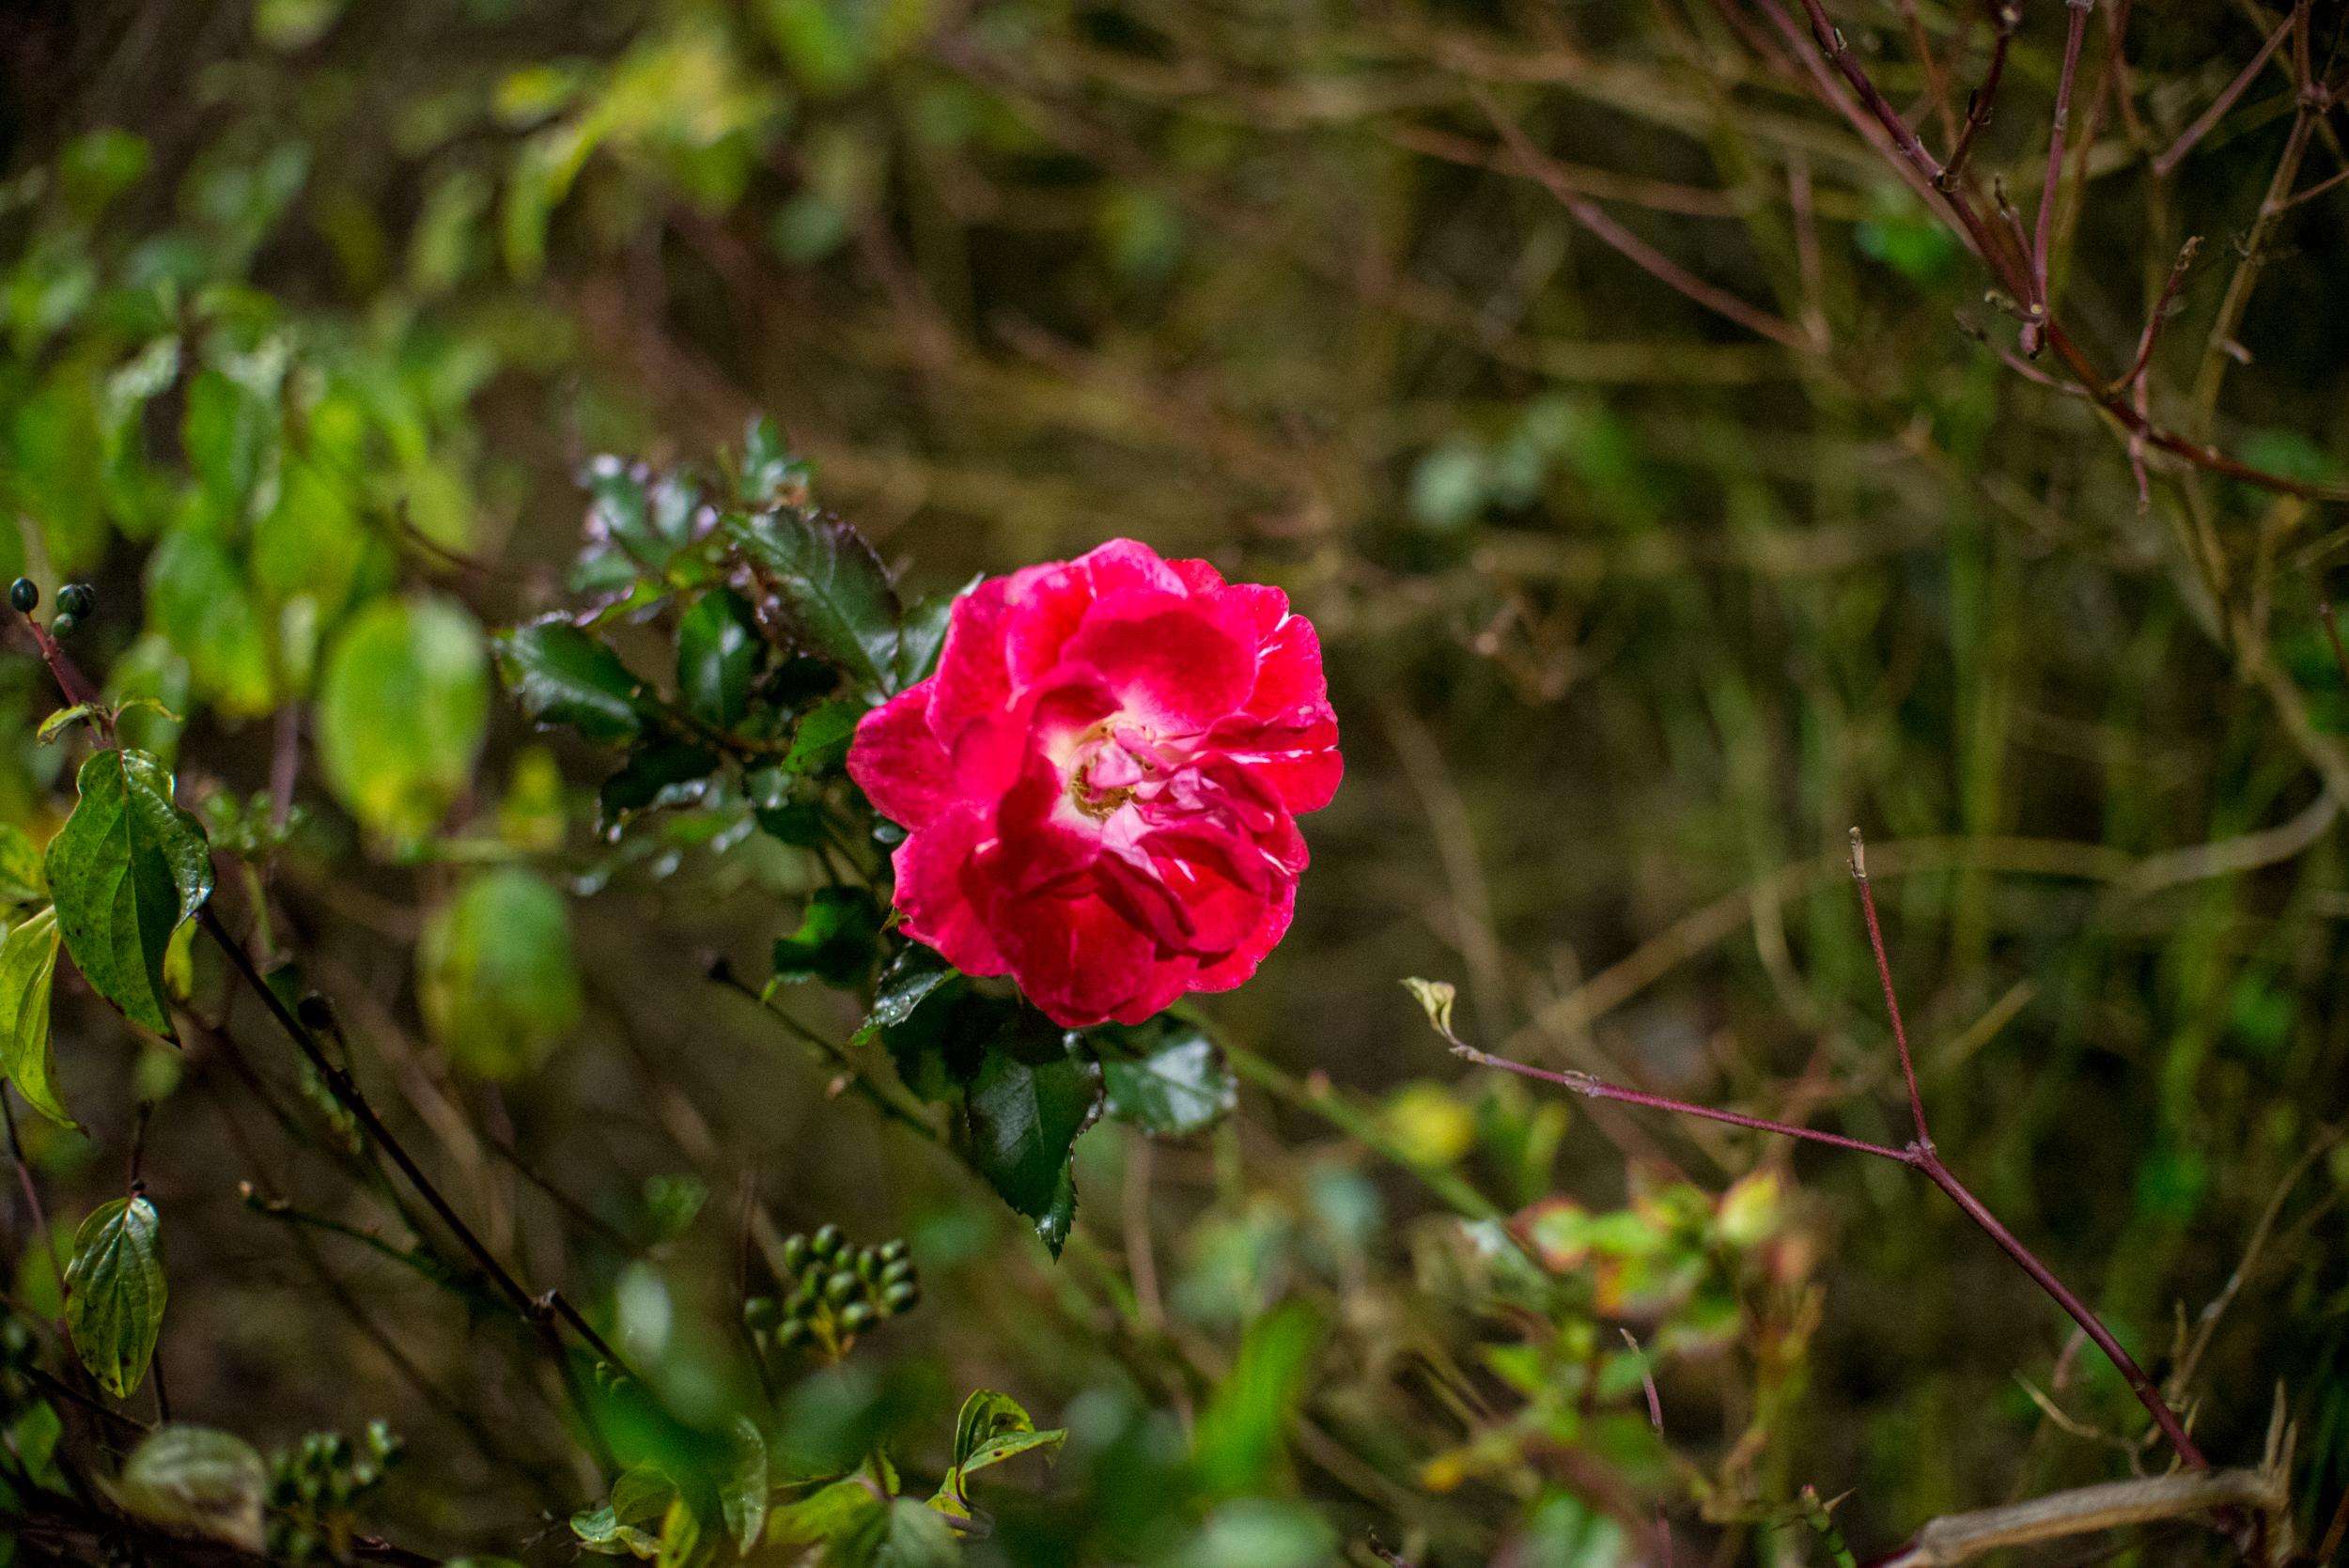 HACKNEY ROSE - JAN 2019